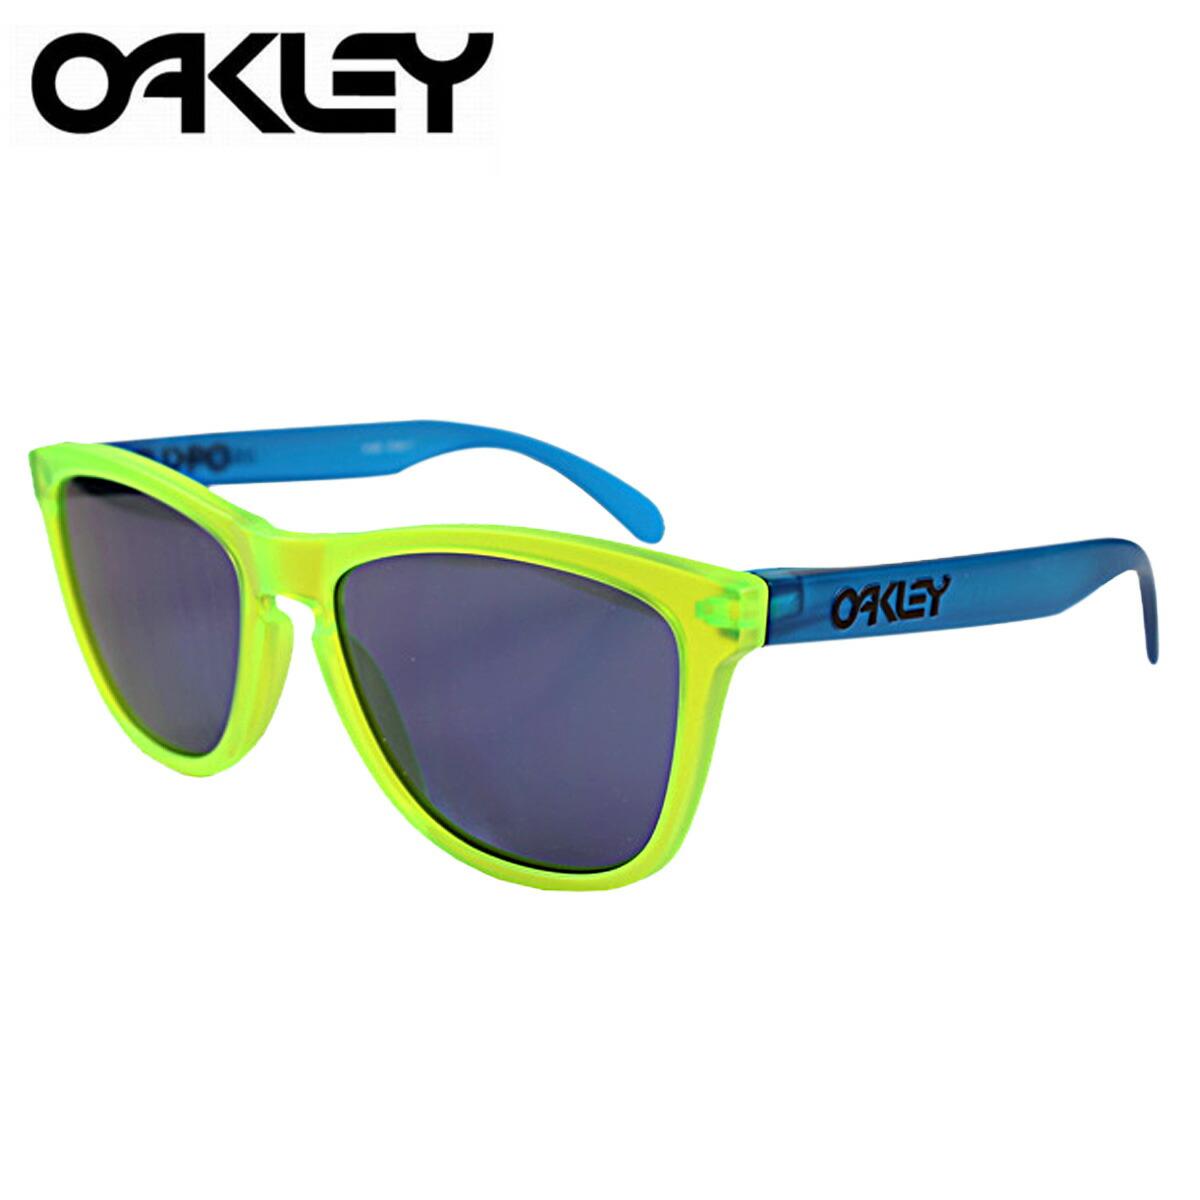 oakley sunglasses brands